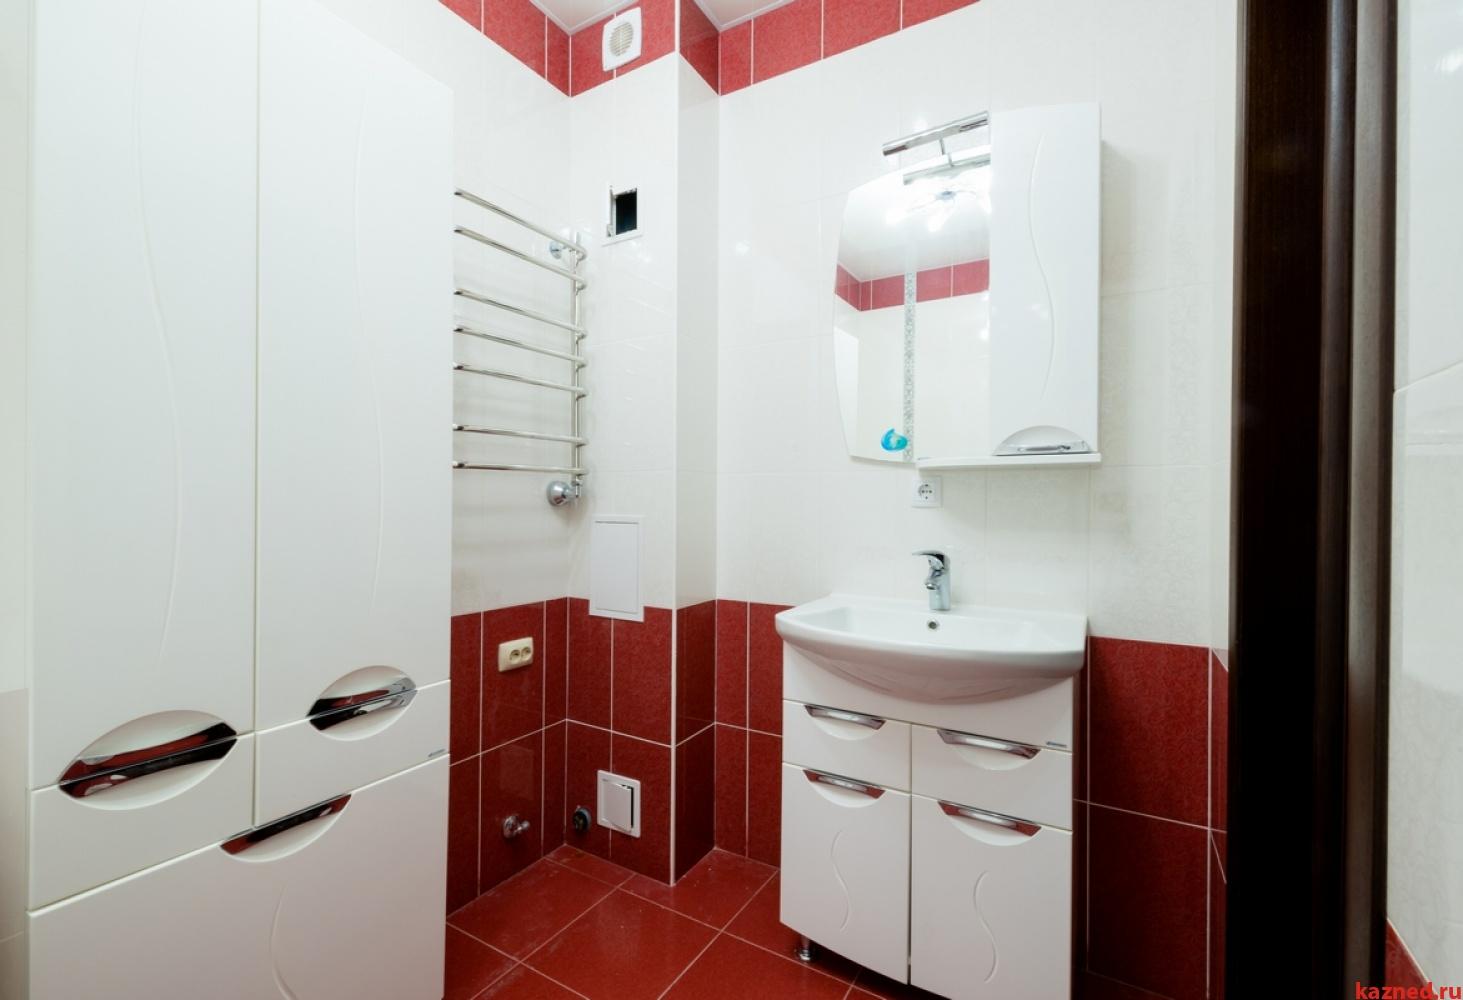 Продажа 2-к квартиры Баки Урманче д.6, 72 м² (миниатюра №6)